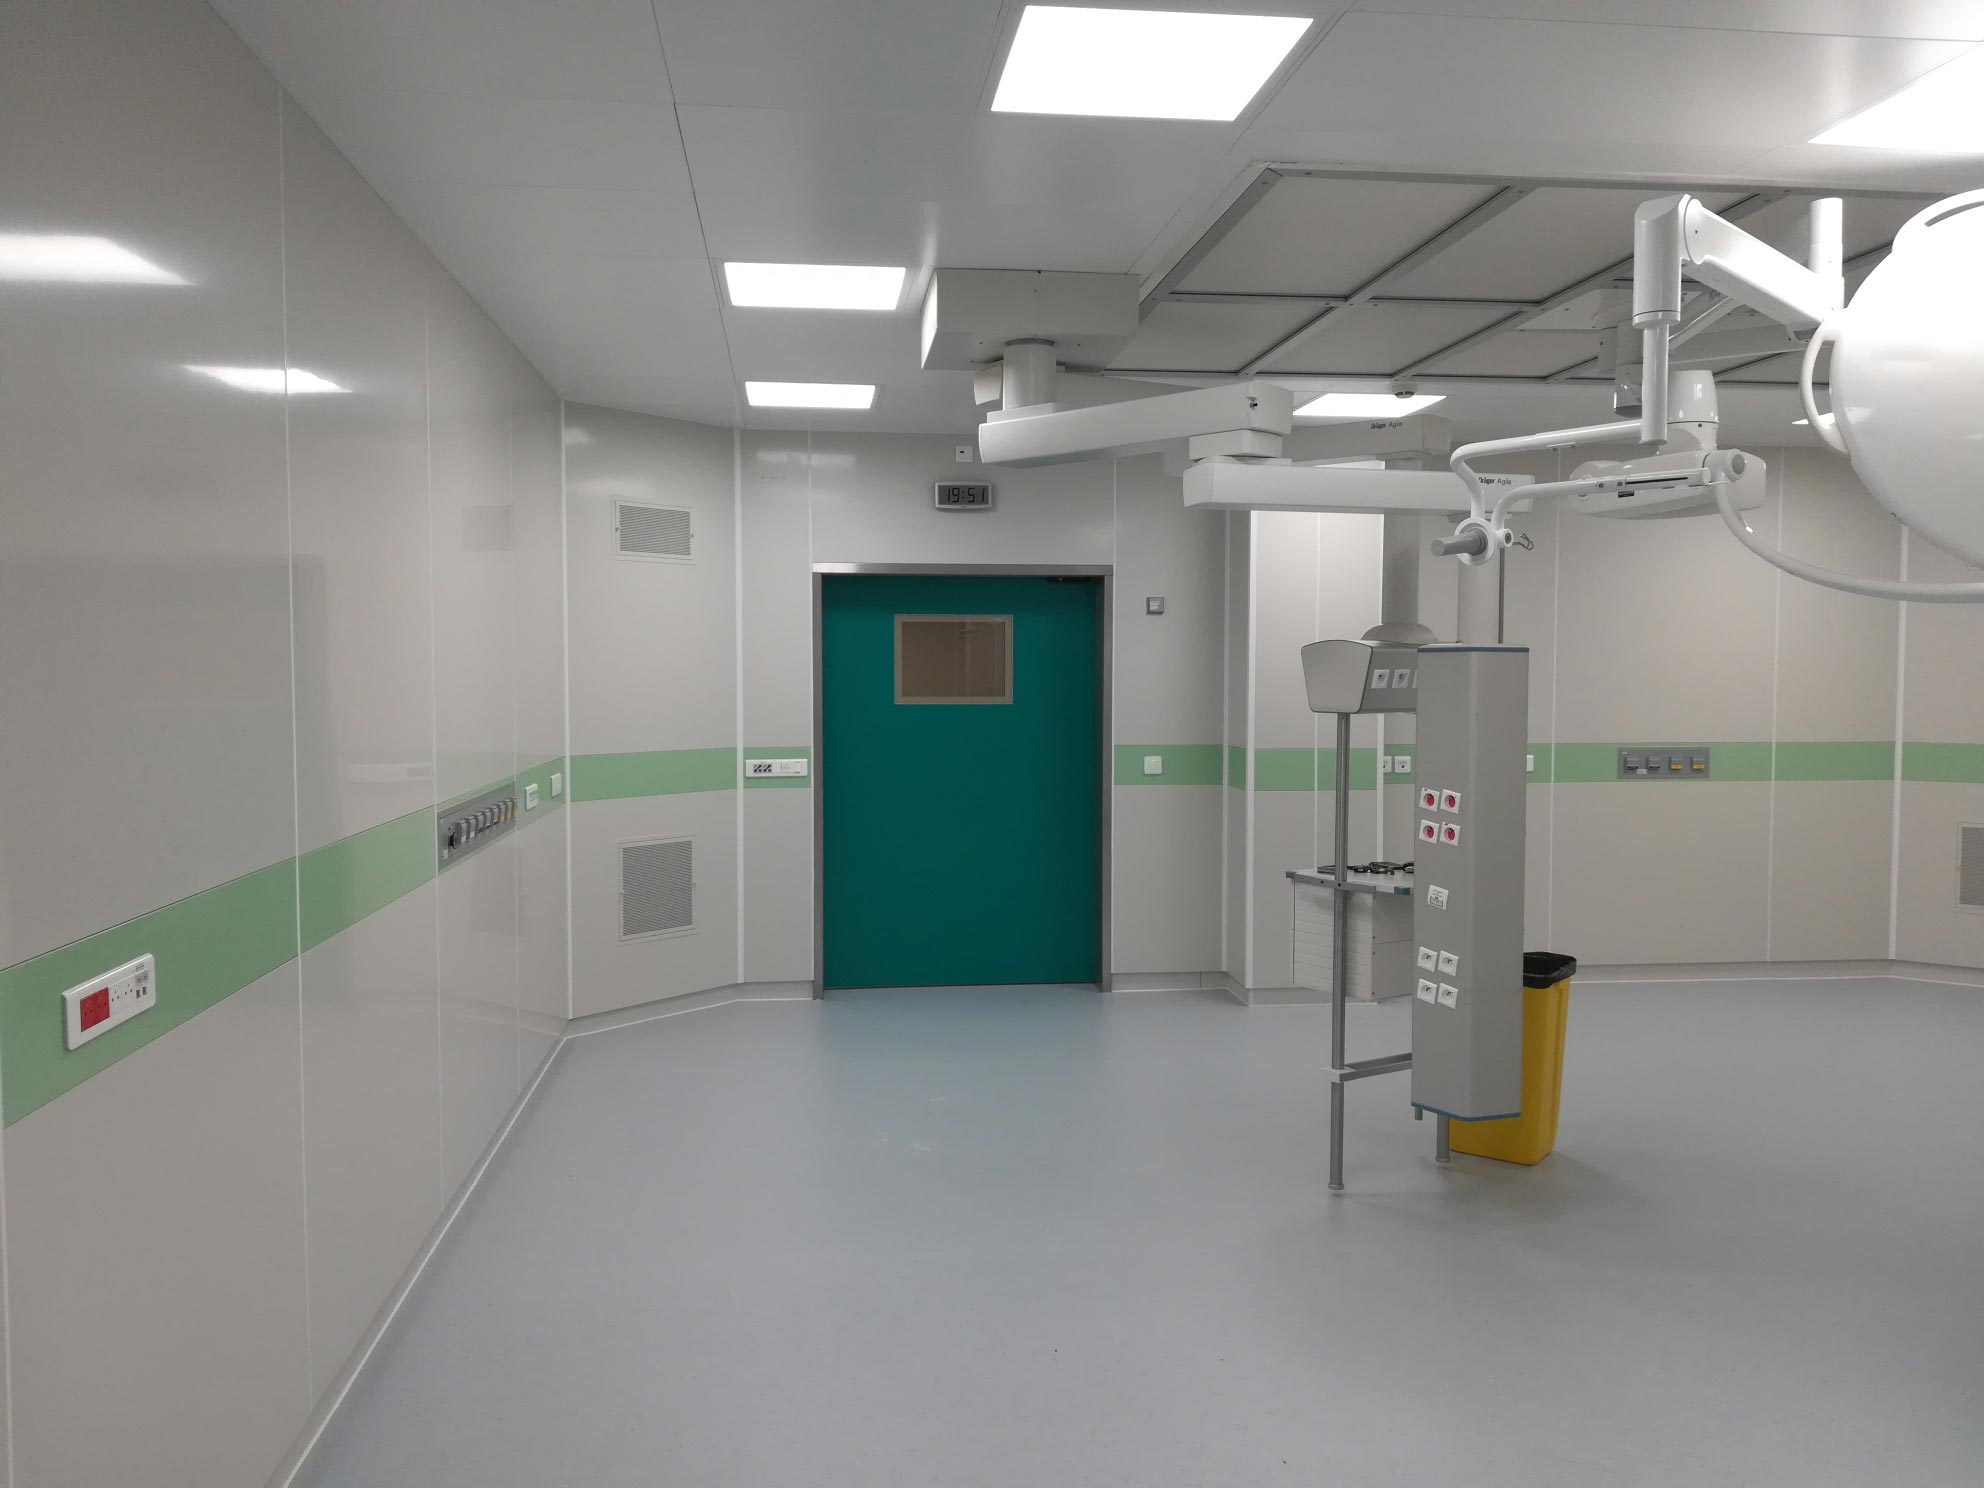 Referenz modulares Raumsystem Frankreich- Centre Hospitalier- Brive